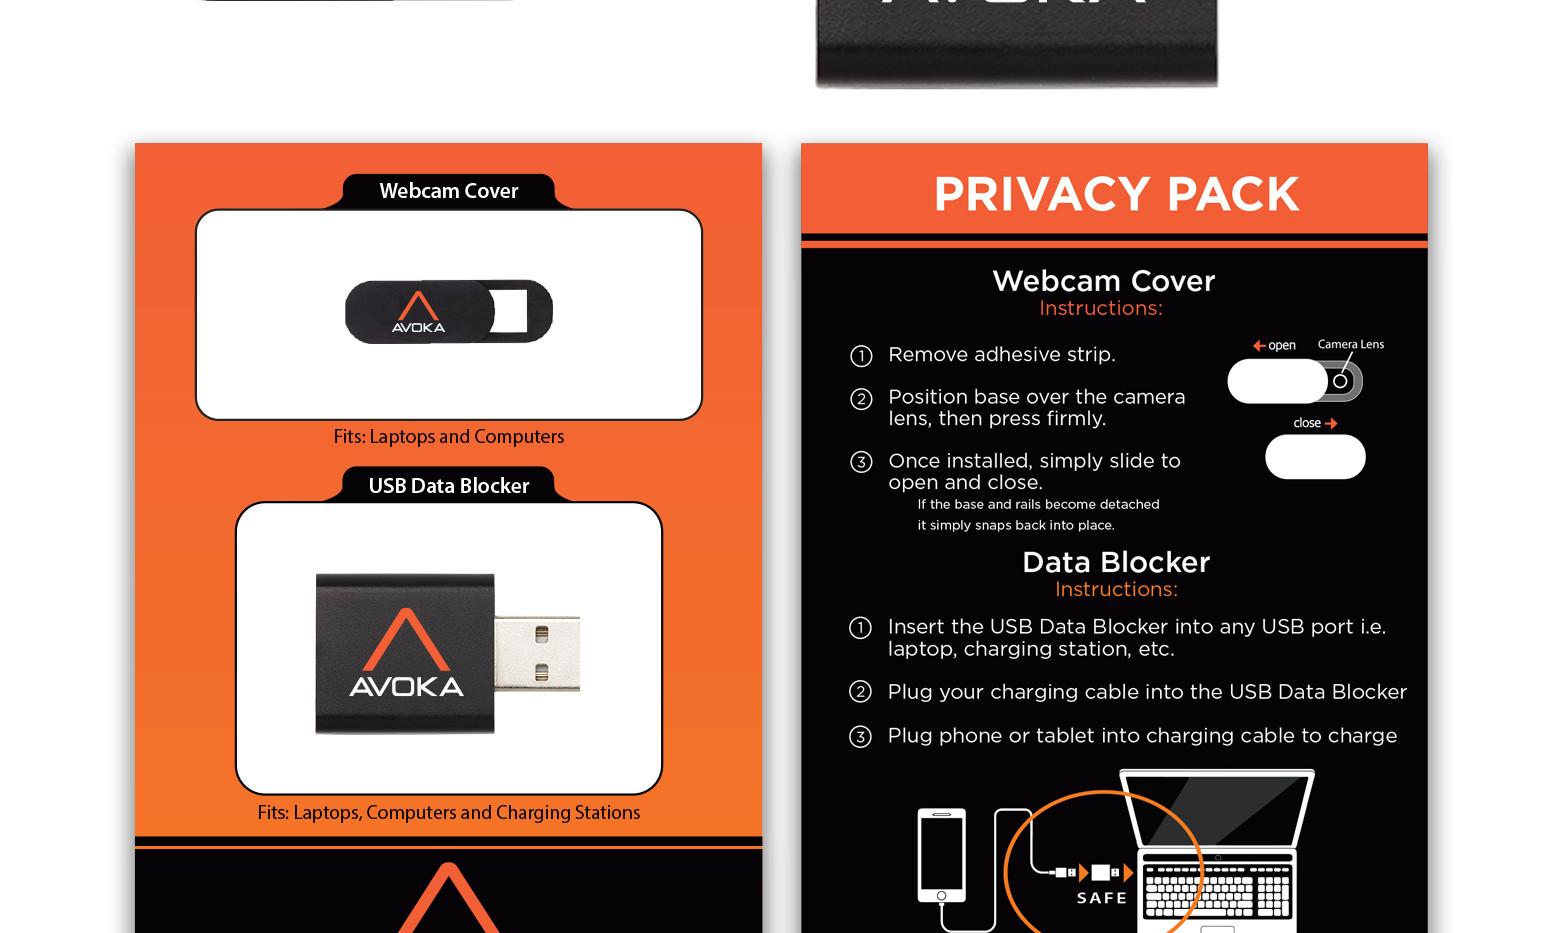 Avoka Privacy 2 Pack CUSTOM.jpg